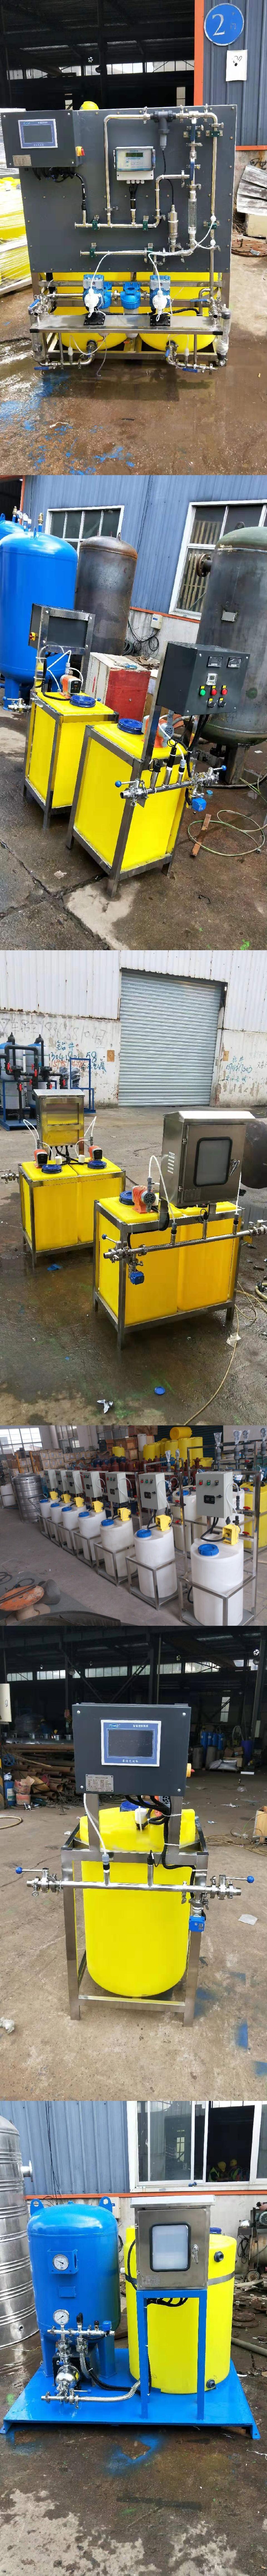 Hot Selling Machine Chemische Chloordioxide Generator Chips